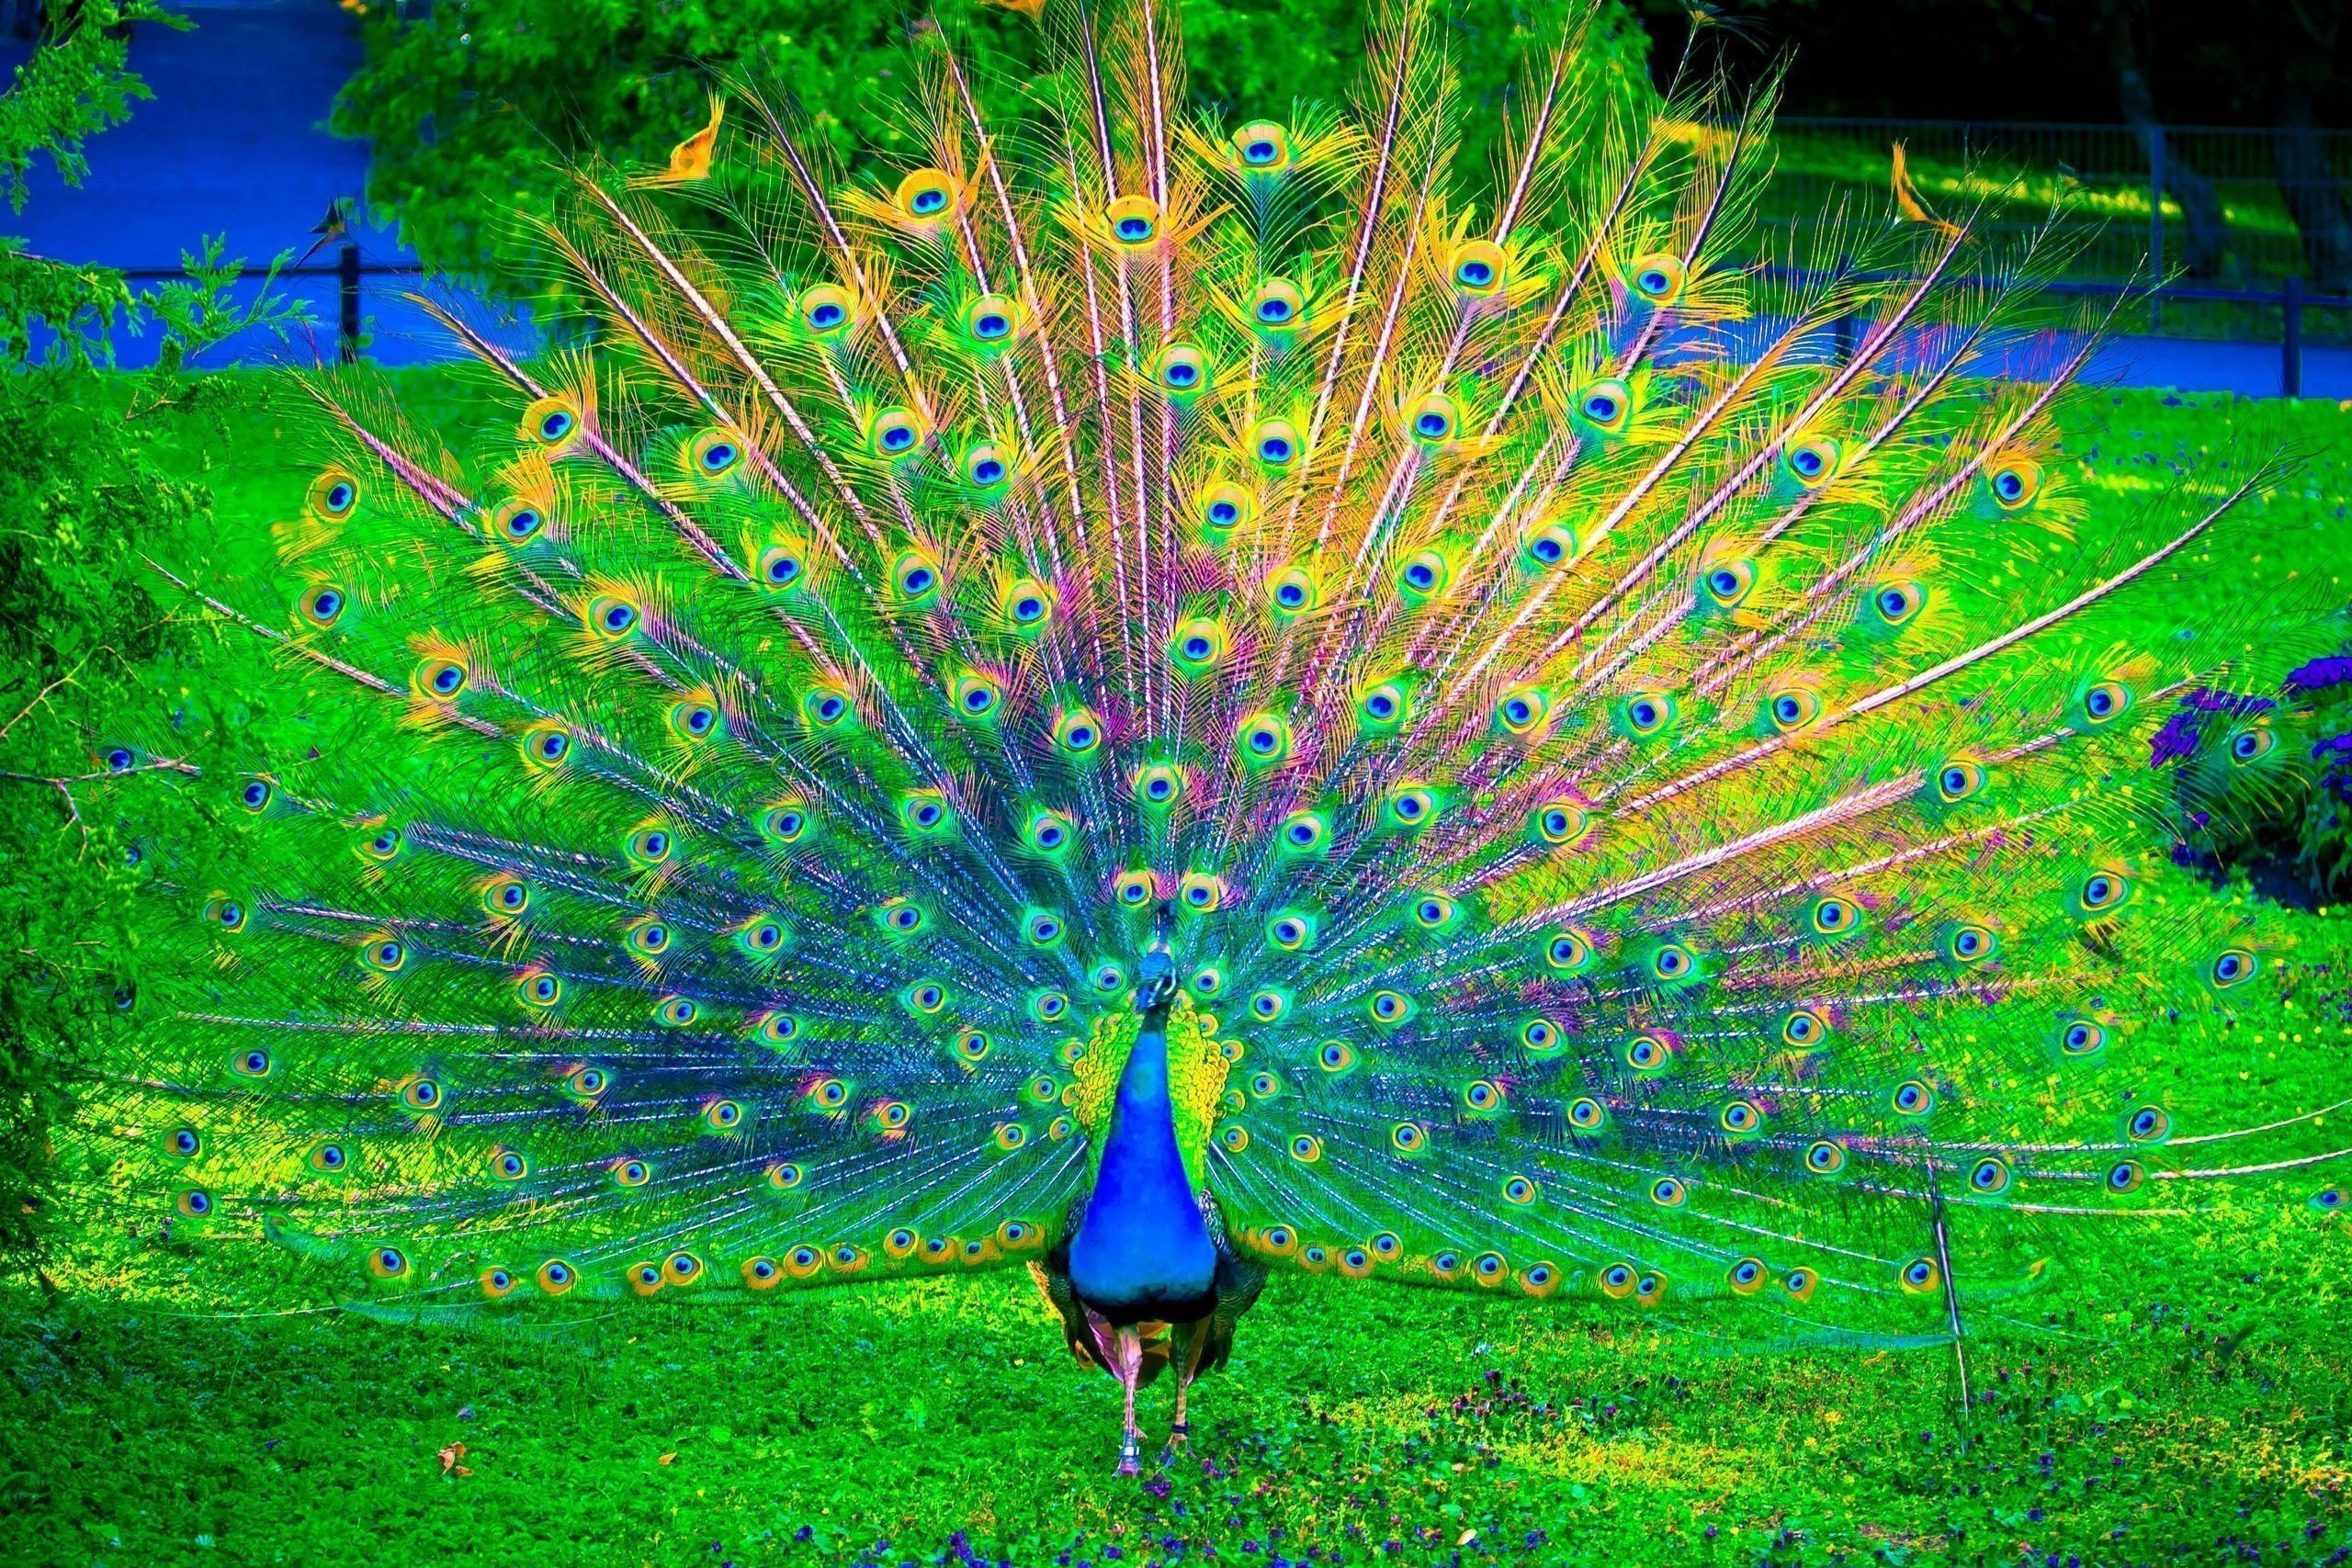 Wallpaper Peacock 63 Images